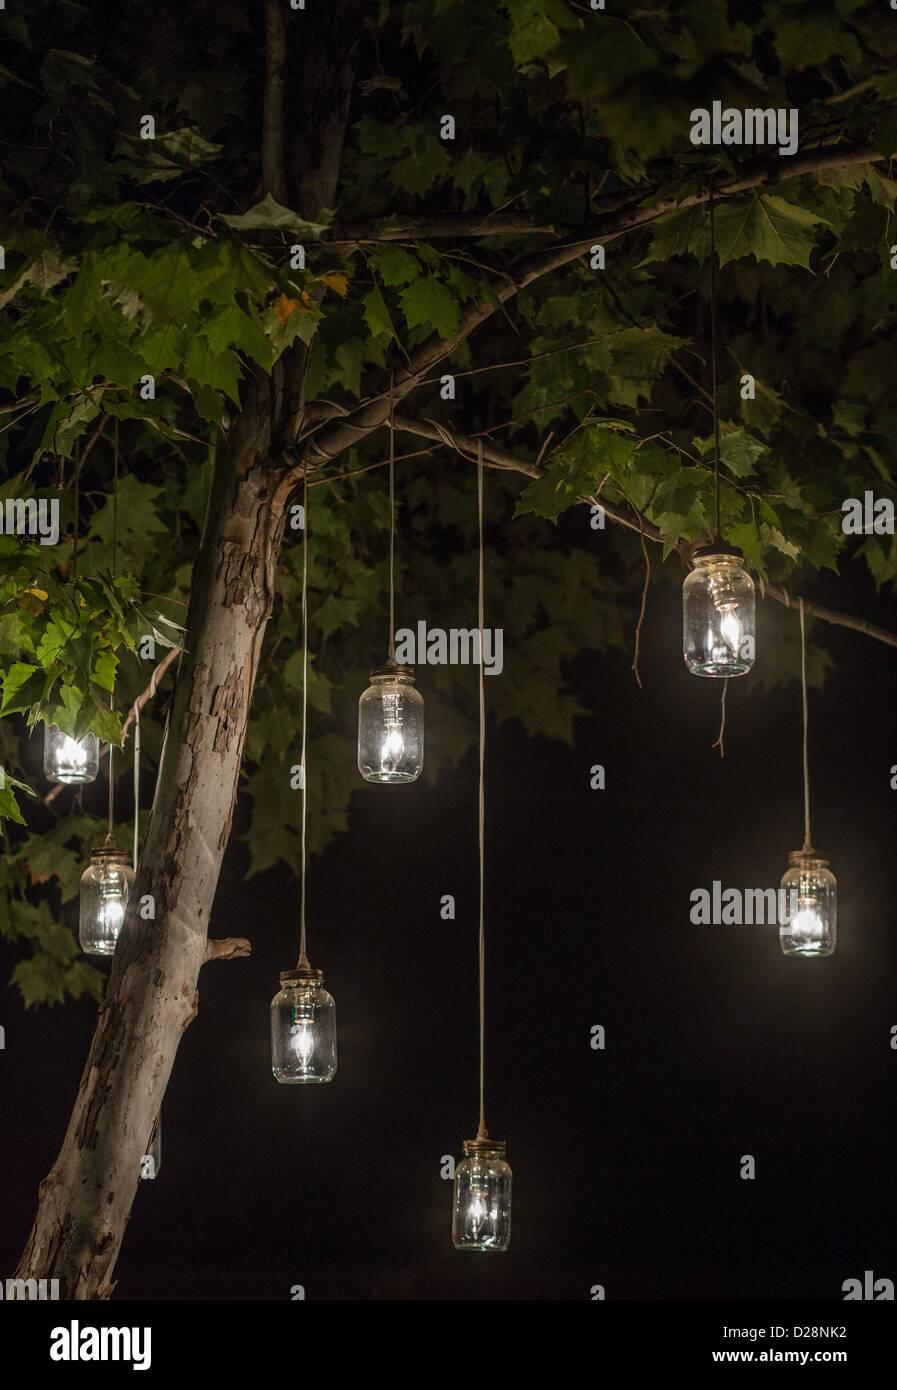 Glowing Mason Jar Lights Hanging From A Tree Stock Photo